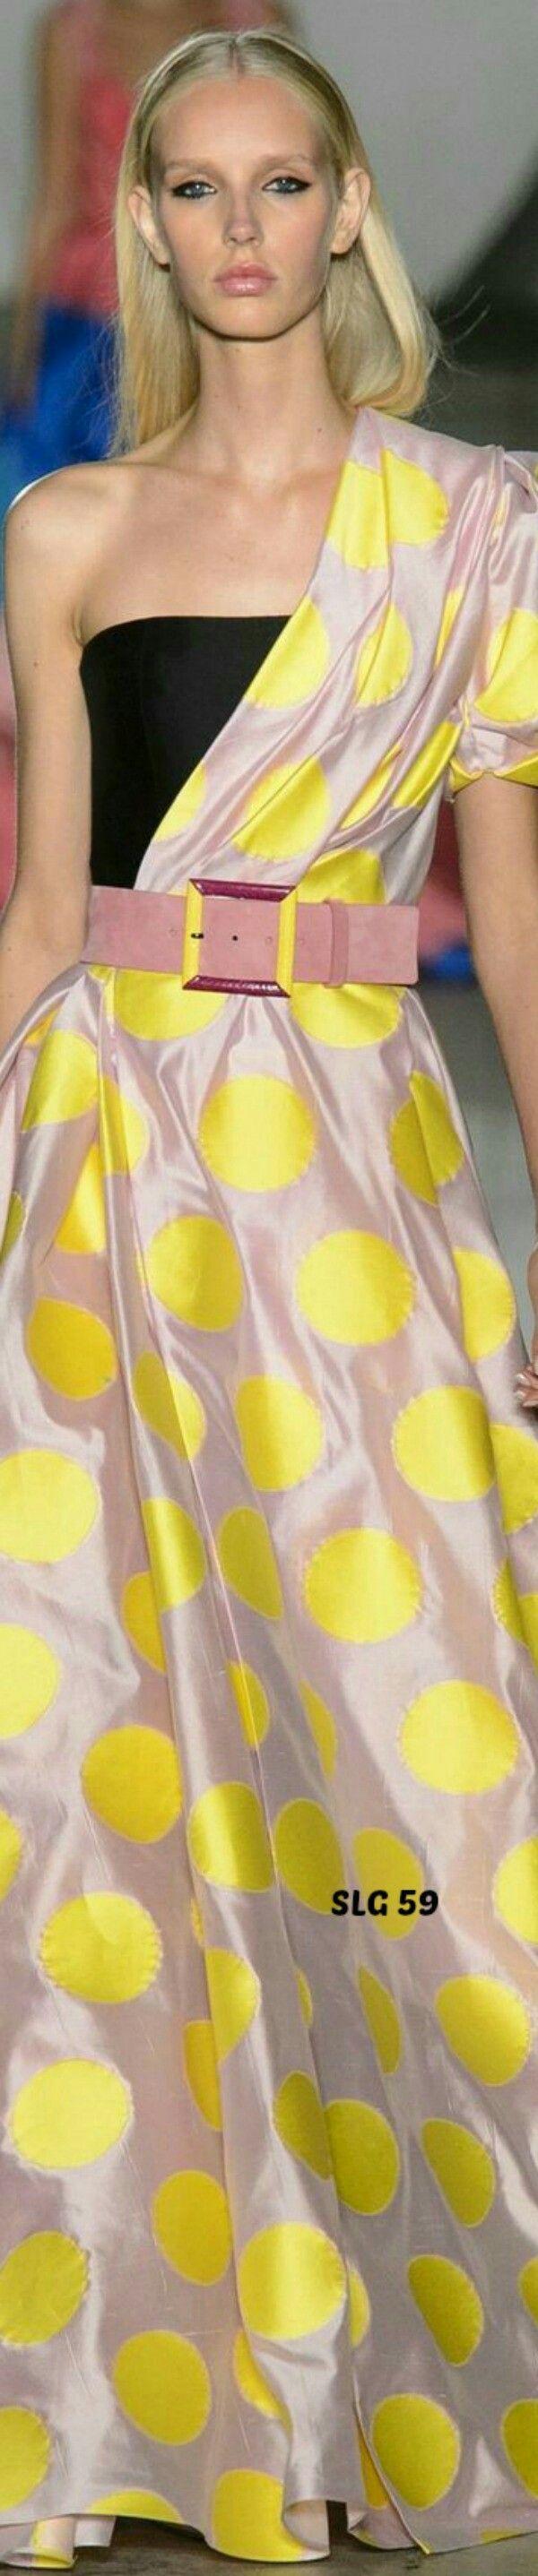 Carolina Herrera SS 2018 #perfumes #perfume #michaelkors #carolinaherrera #perfumeimportado